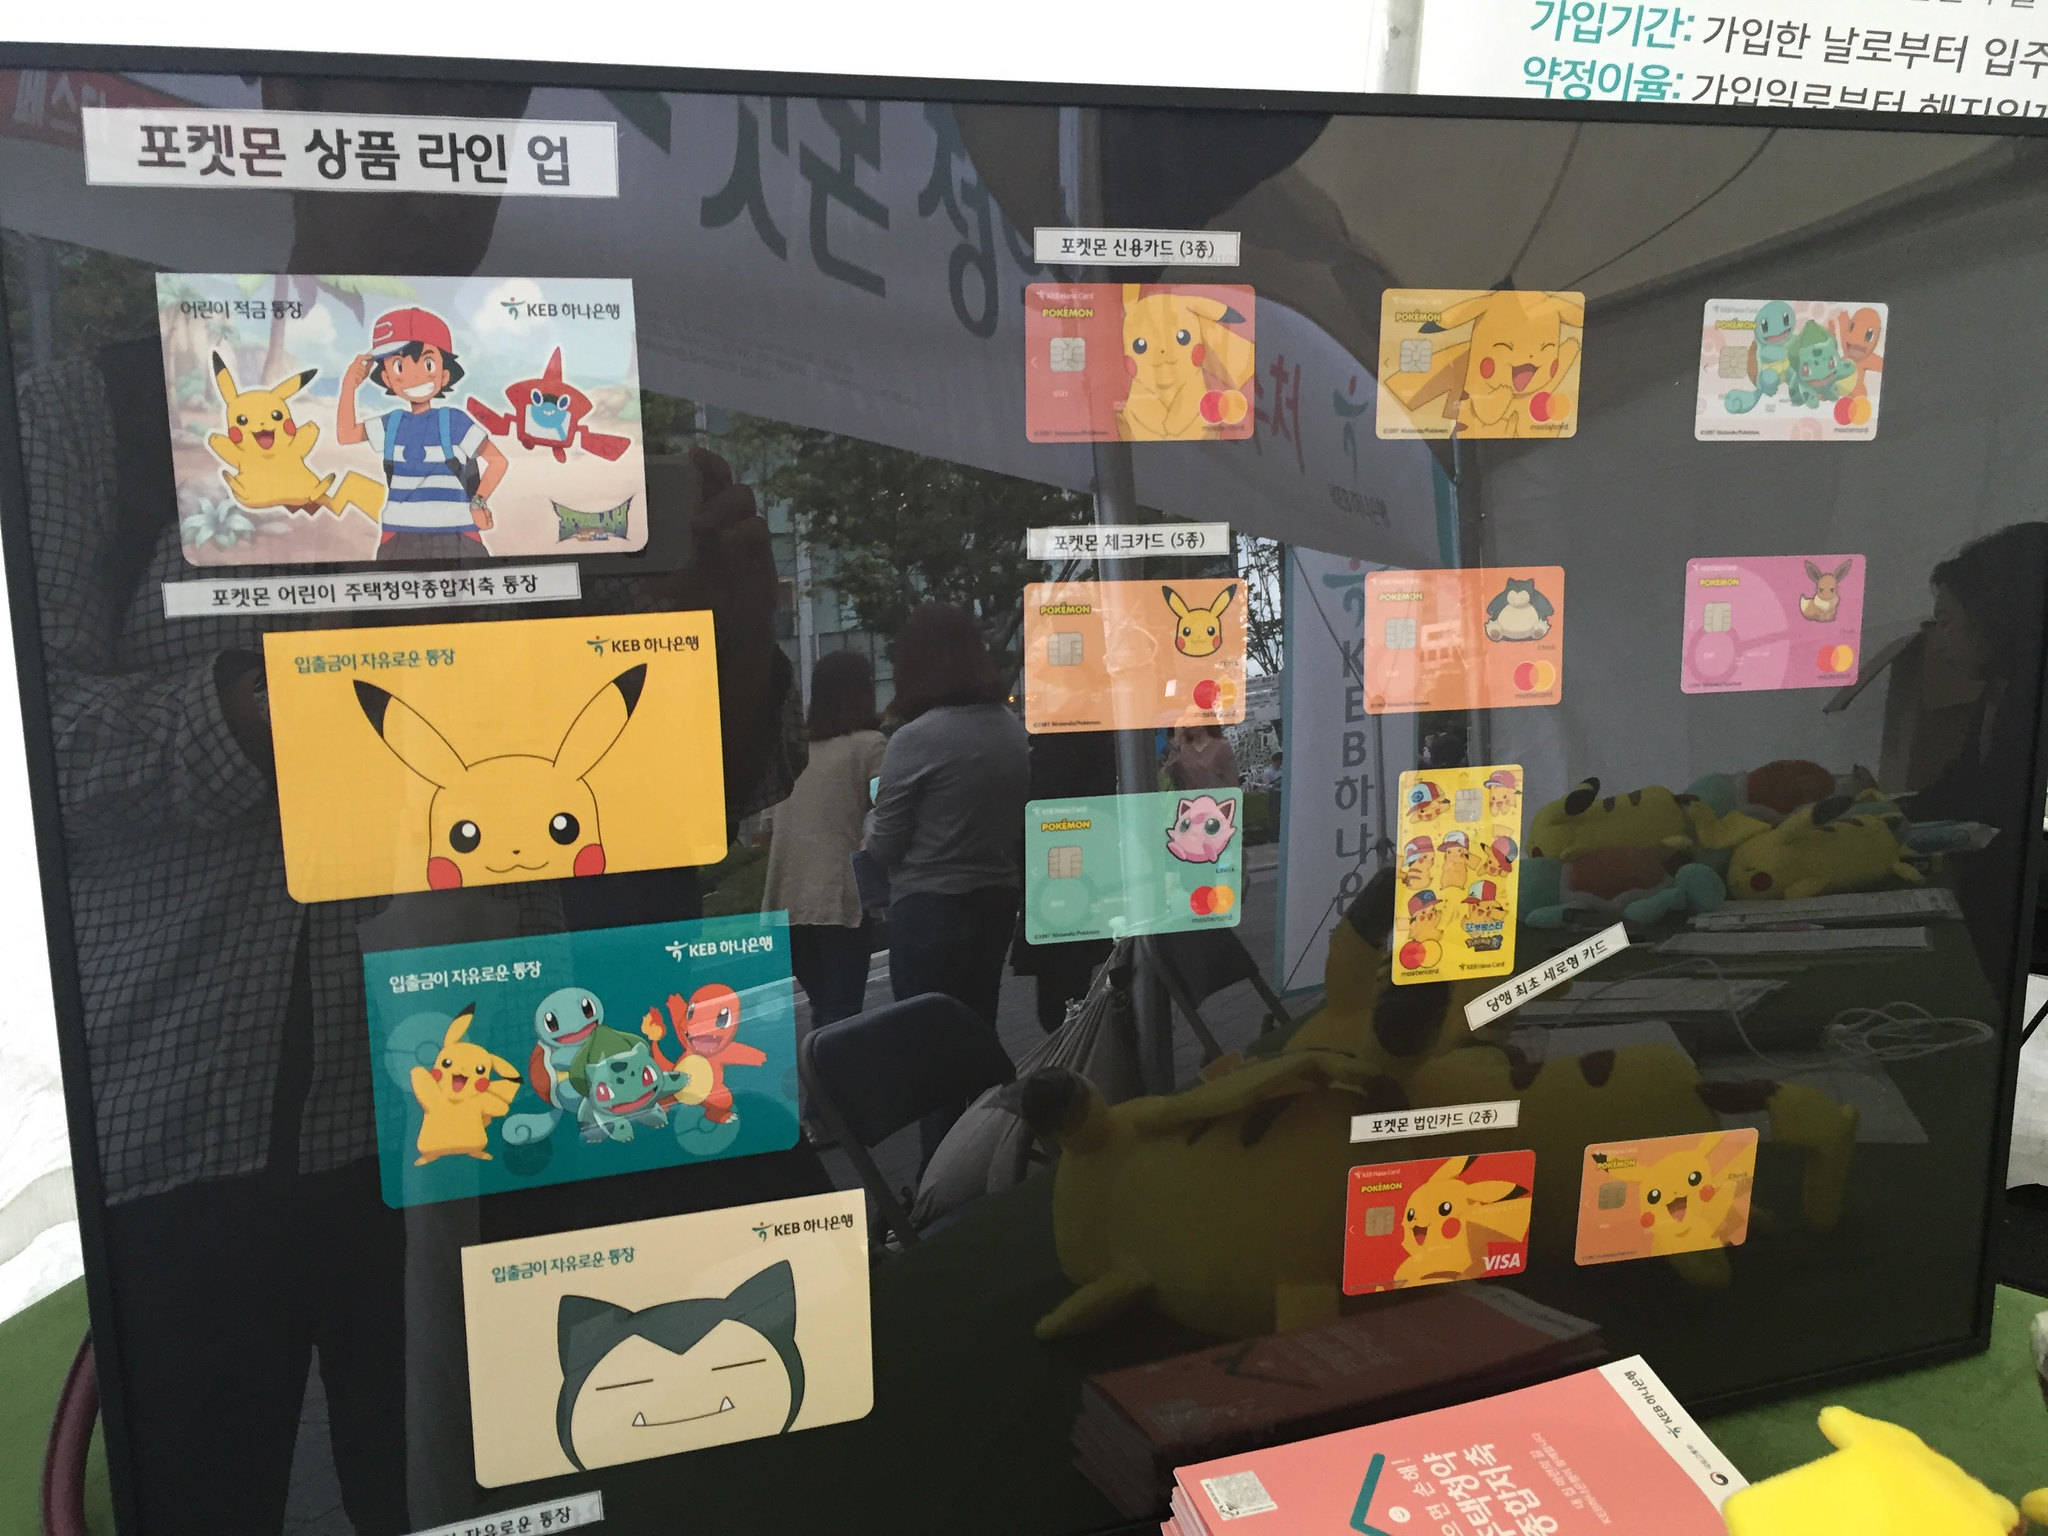 keb_hana_bank_and_sk_telecom_pokemon_go_week_at_pokemon_fest_2018_postcards